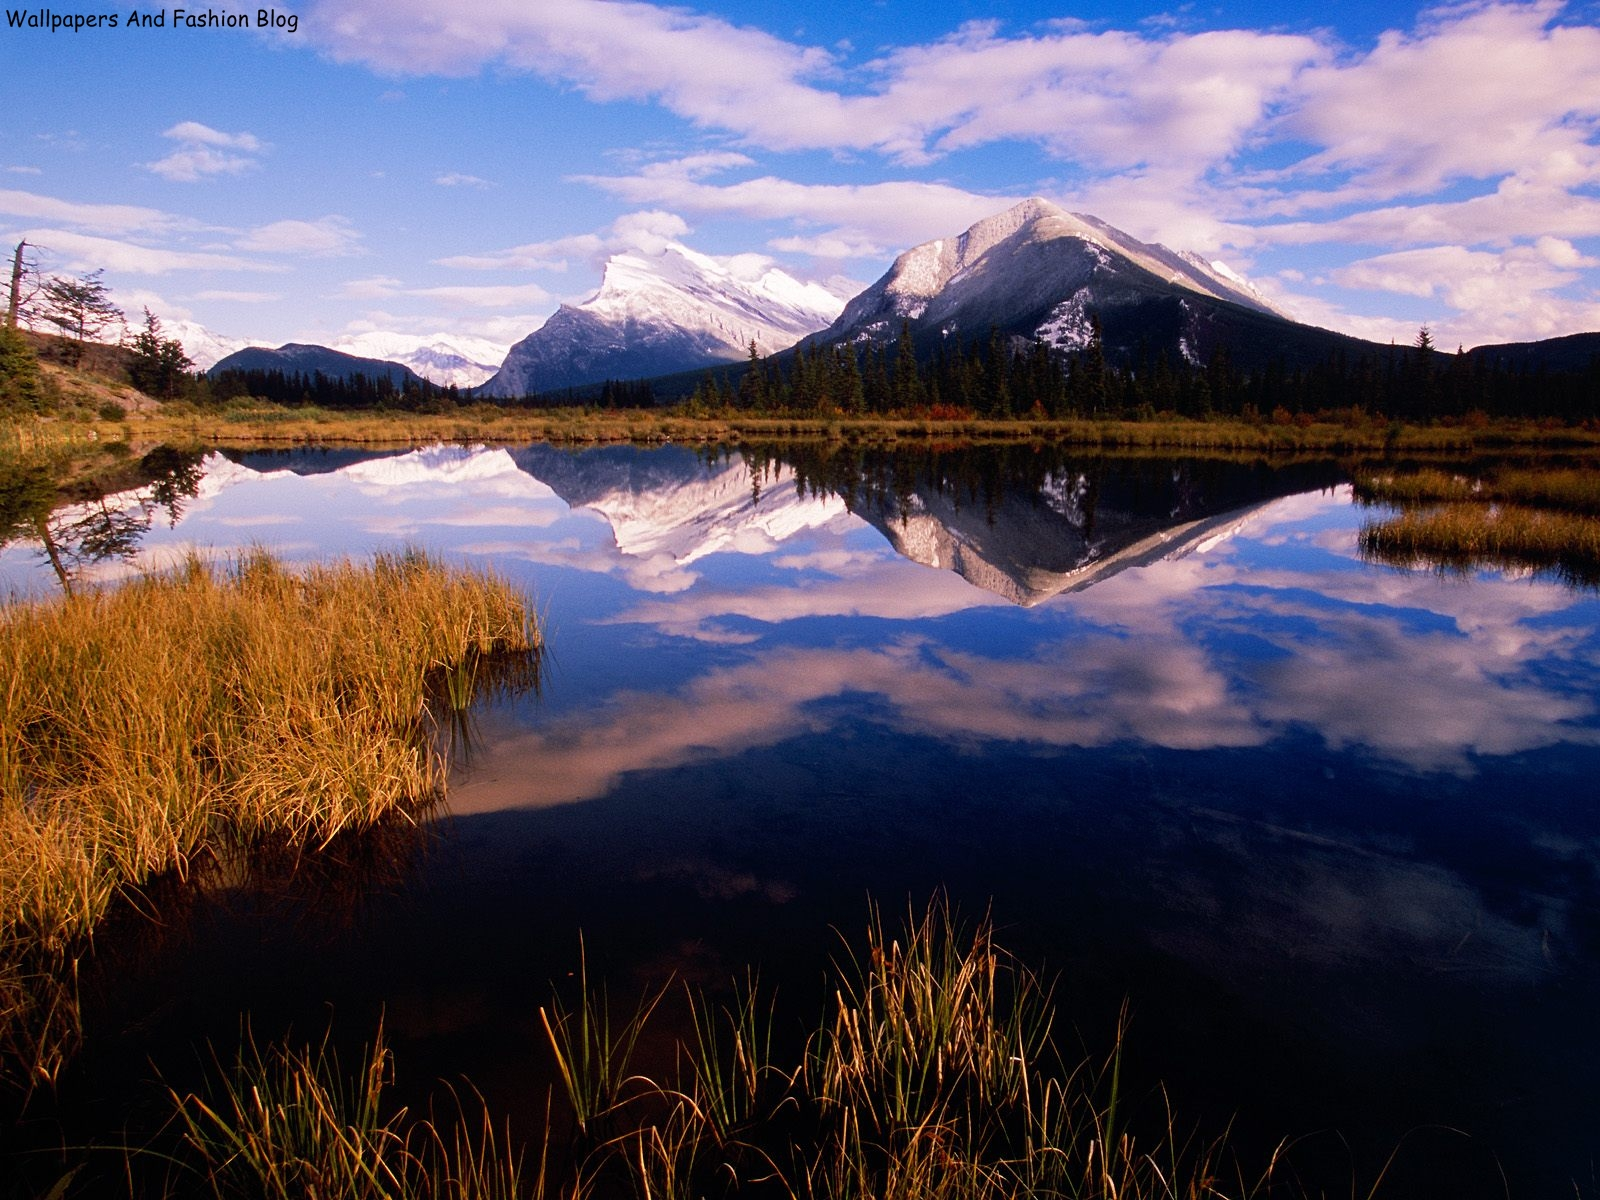 http://2.bp.blogspot.com/-fHSqptIw7Ls/UCxXJK5gtAI/AAAAAAAAEVM/EUJVHlGgst0/s1600/Mount+Rundle+From+Vermillion+Lakes,+Banff+National+Park,+Canada.jpg